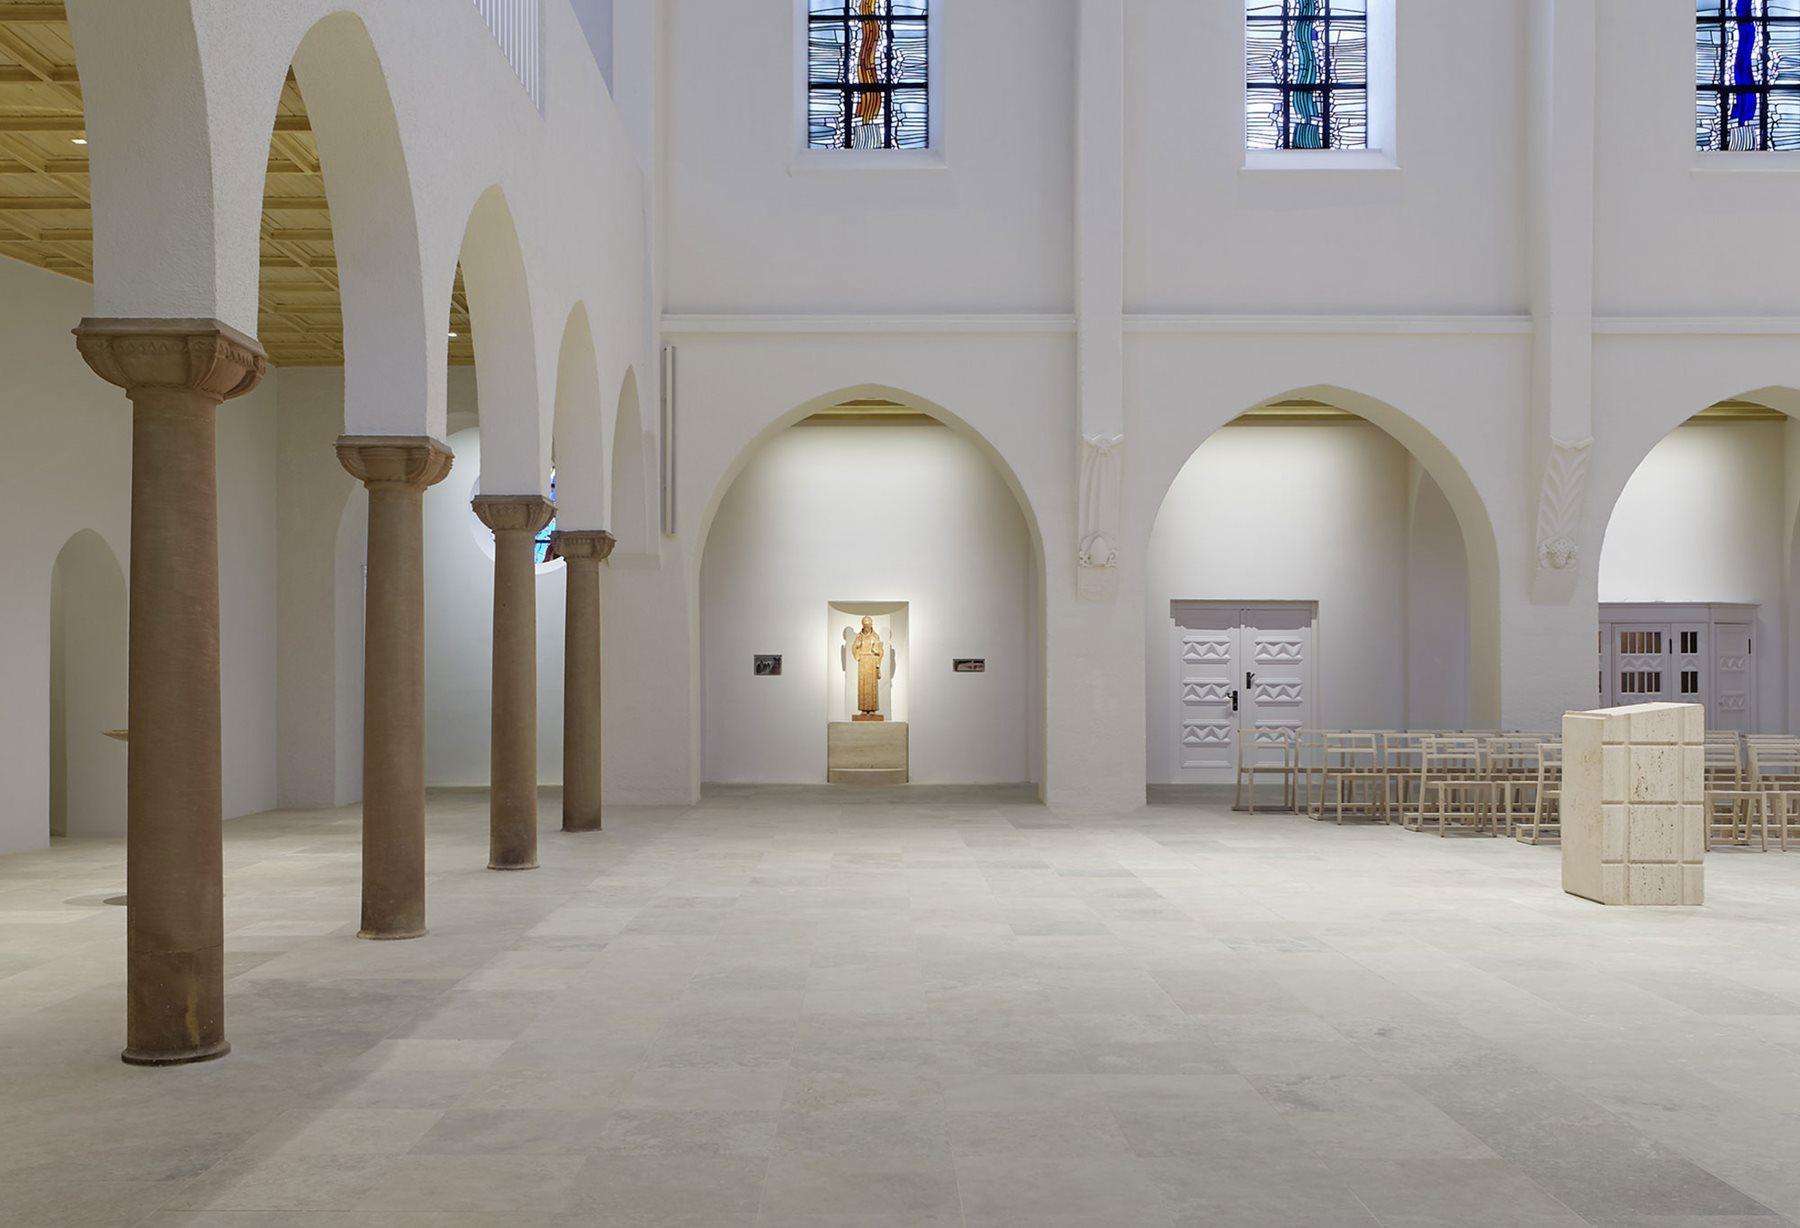 The St Fidelis spiritual centre